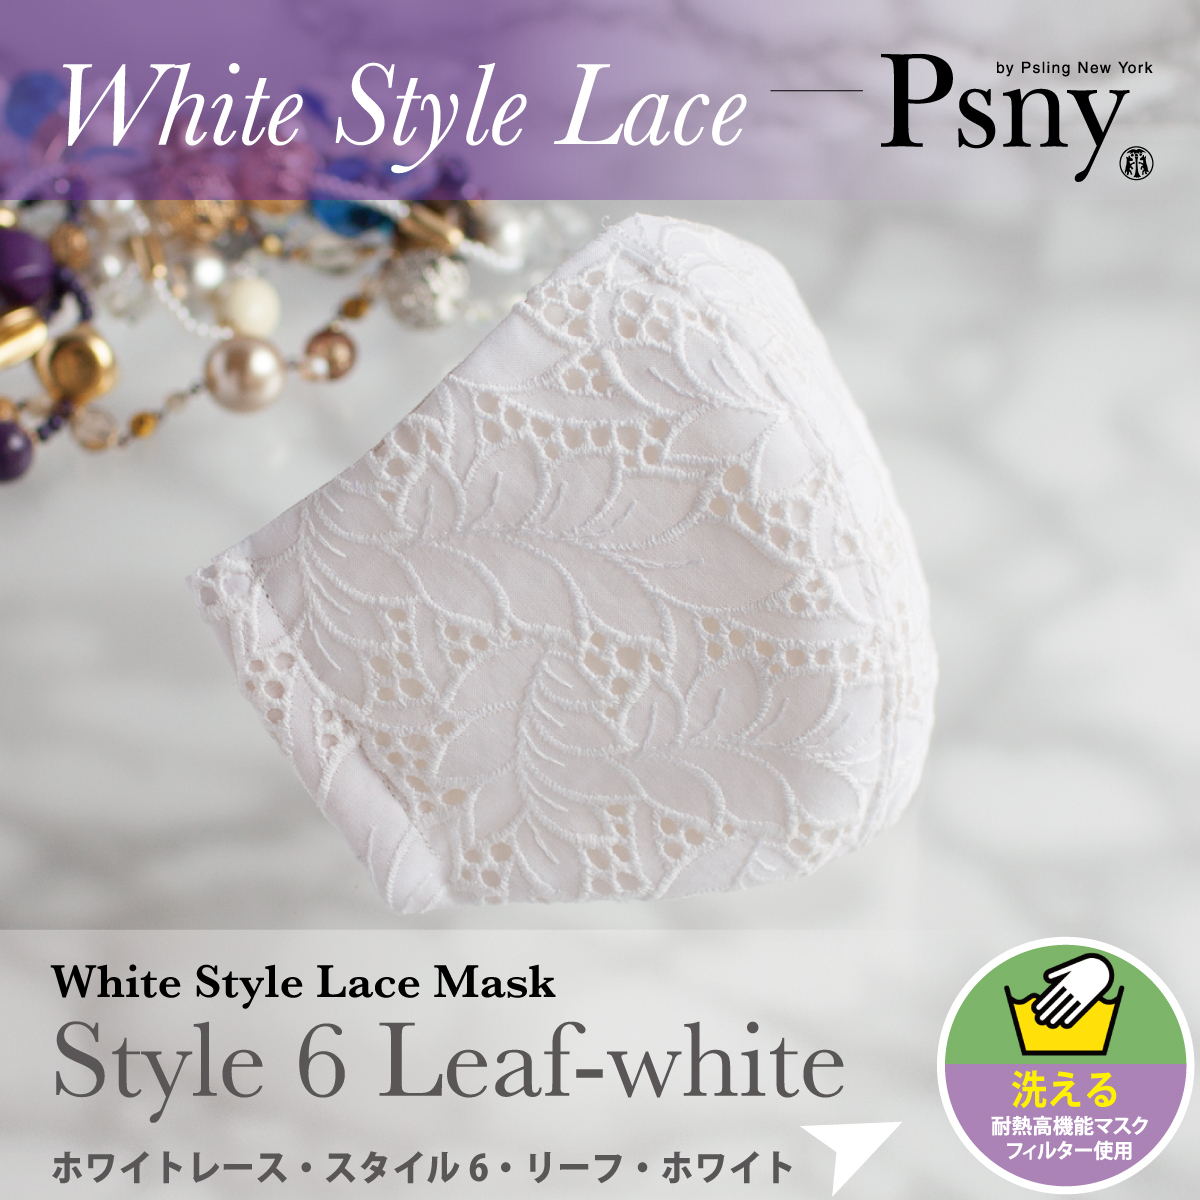 PSNY レース ホワイト スタイル リーフ ホワイト 花粉 不織布フィルター入り 立体 大人用 美しい 高級 セレブ マスク 送料無料 LW6w